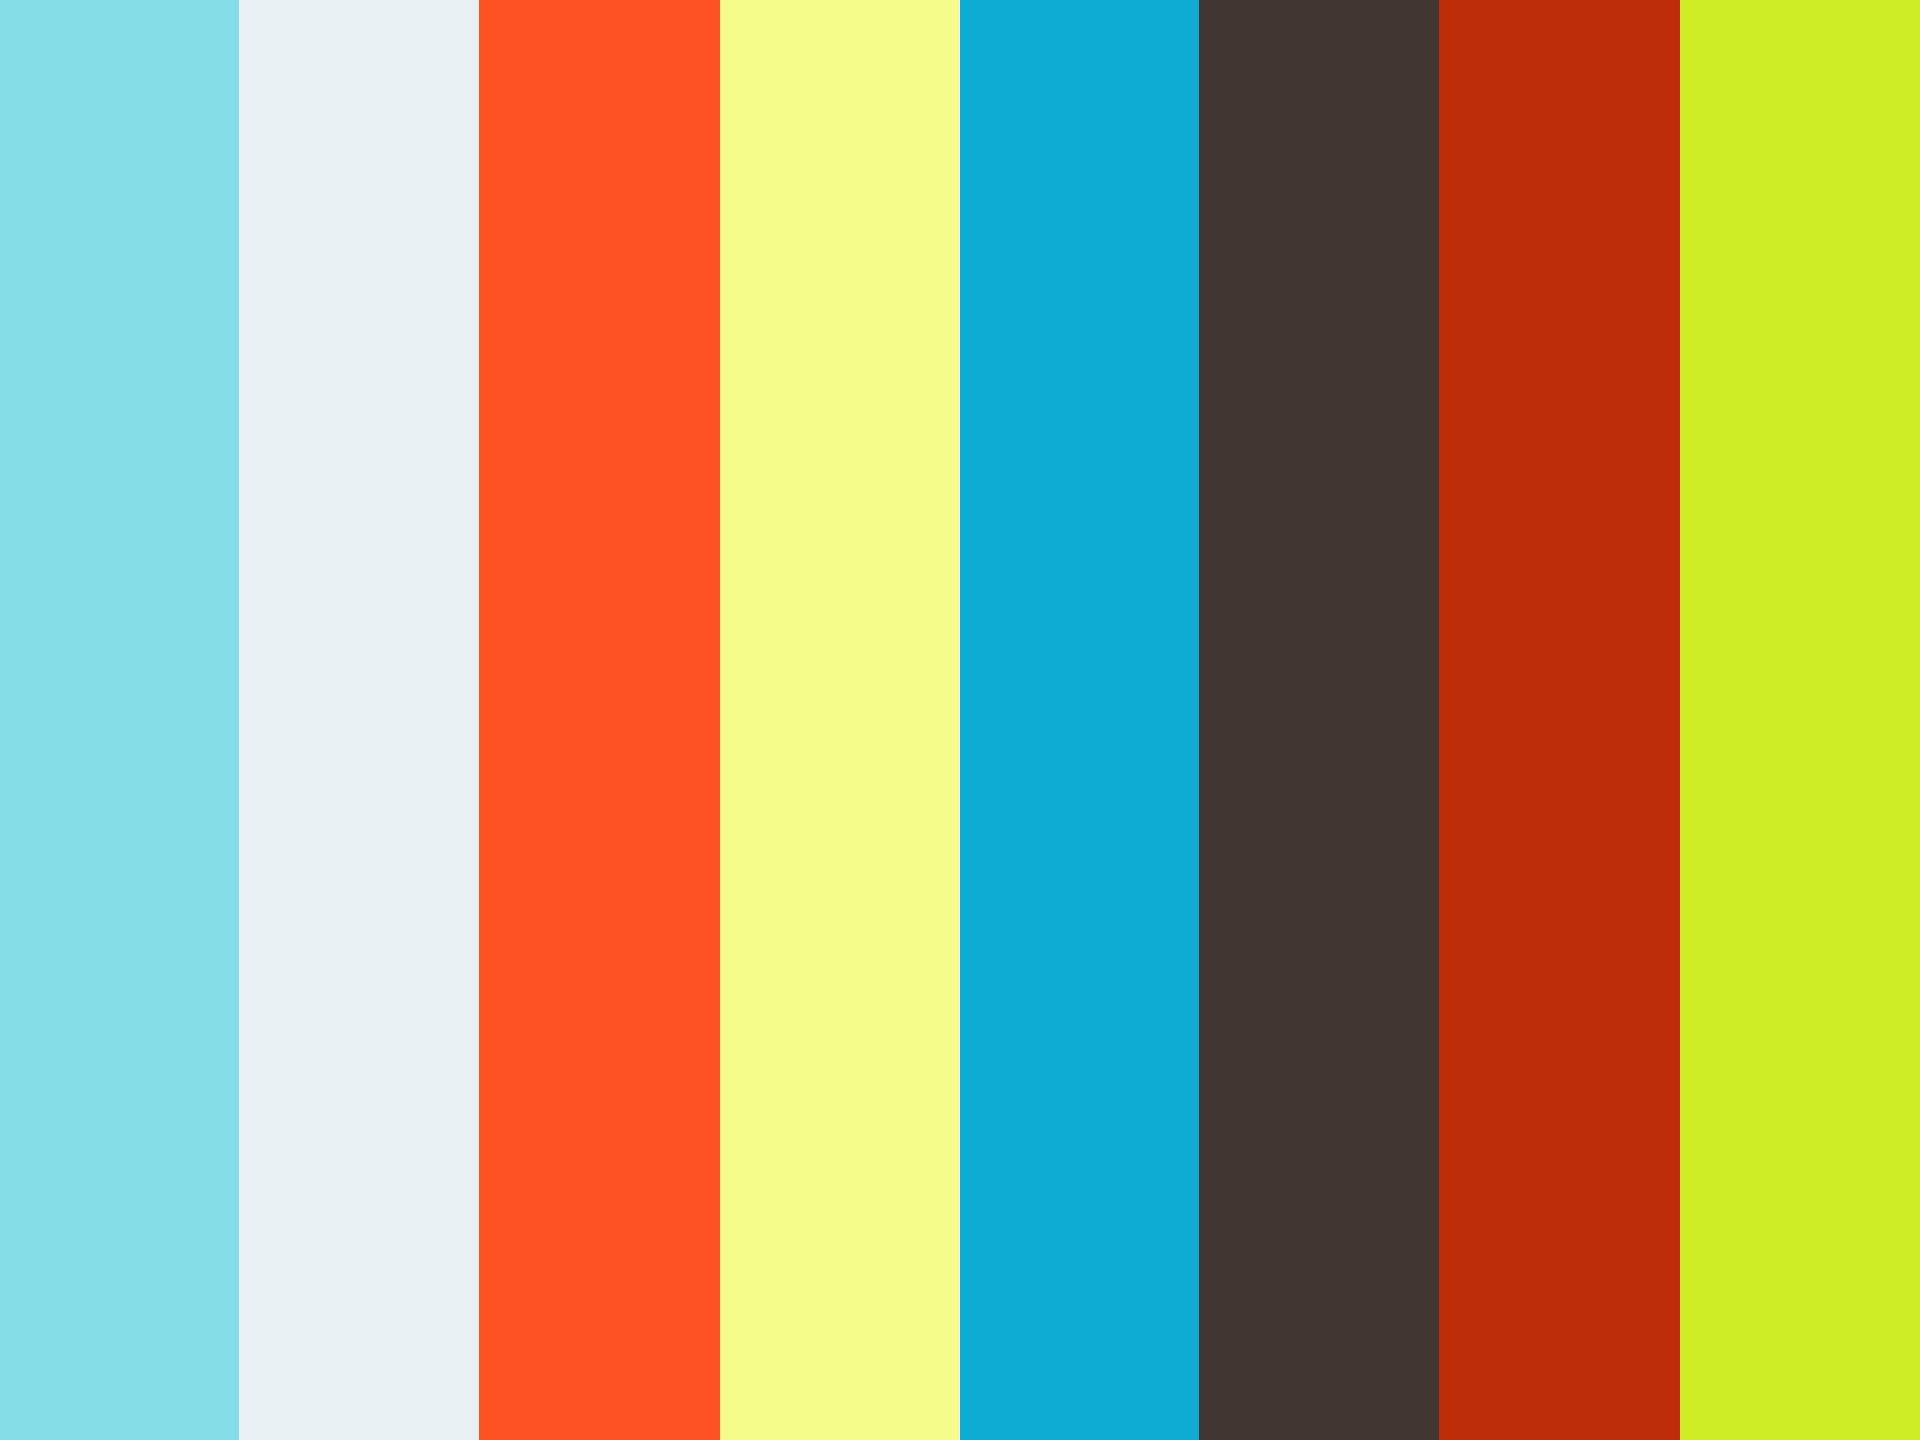 Cabinets To Go Bob Vila 15 On Vimeo